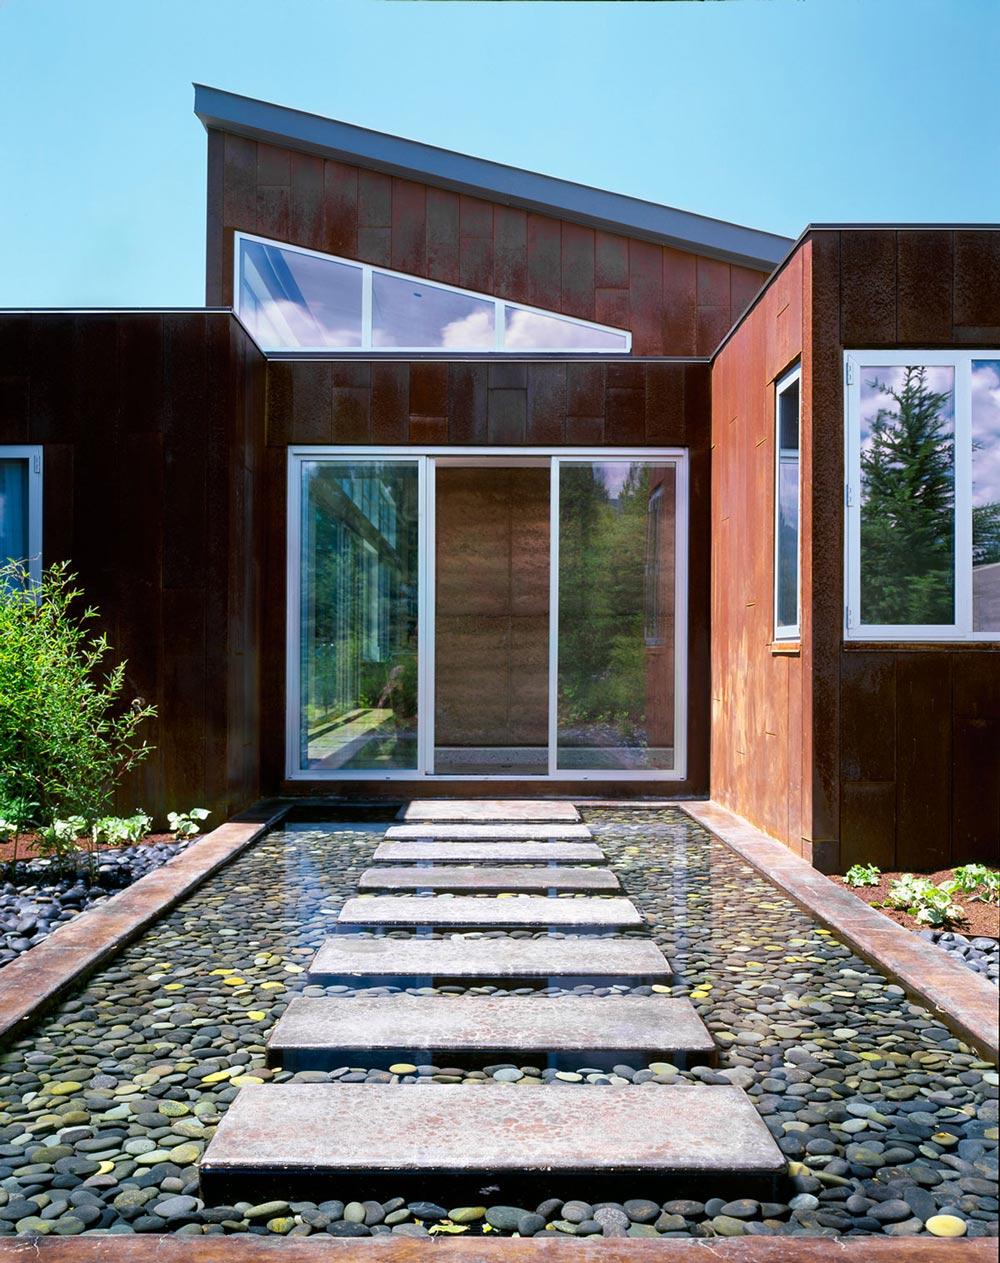 Imposing Contemporary Home in Aspen, Colorado